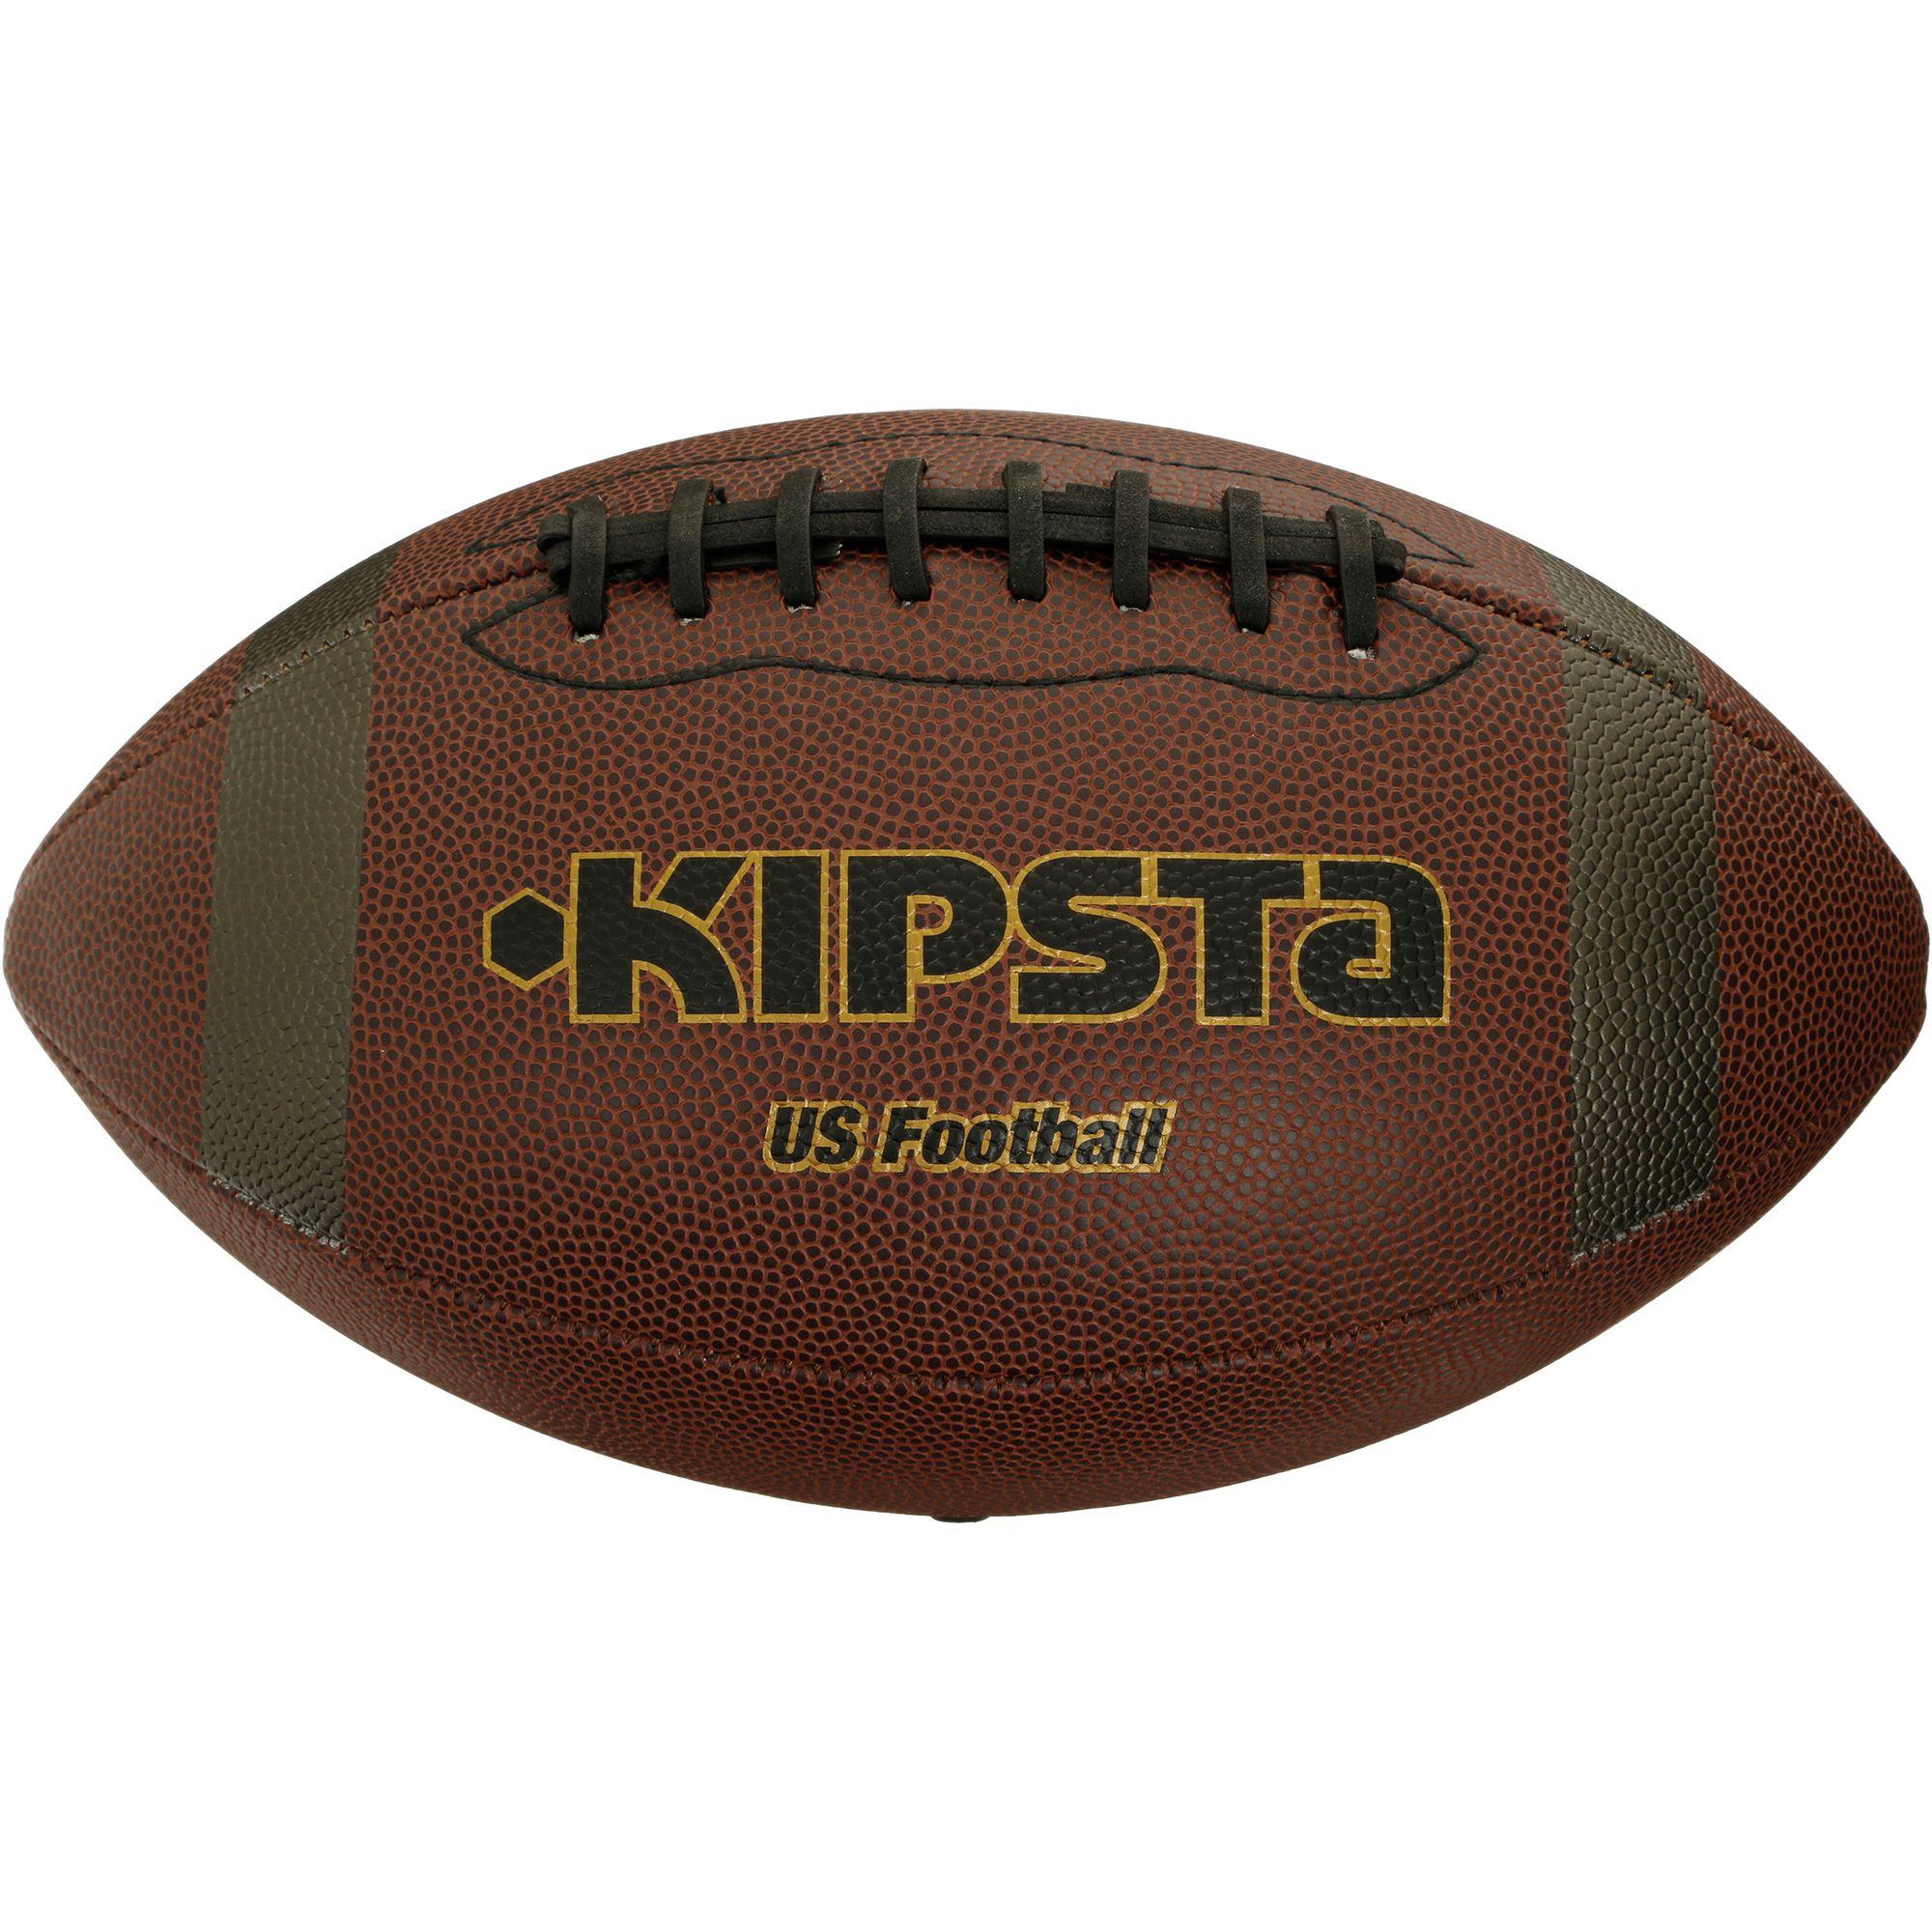 Ballon de football américain AF 500 enfant